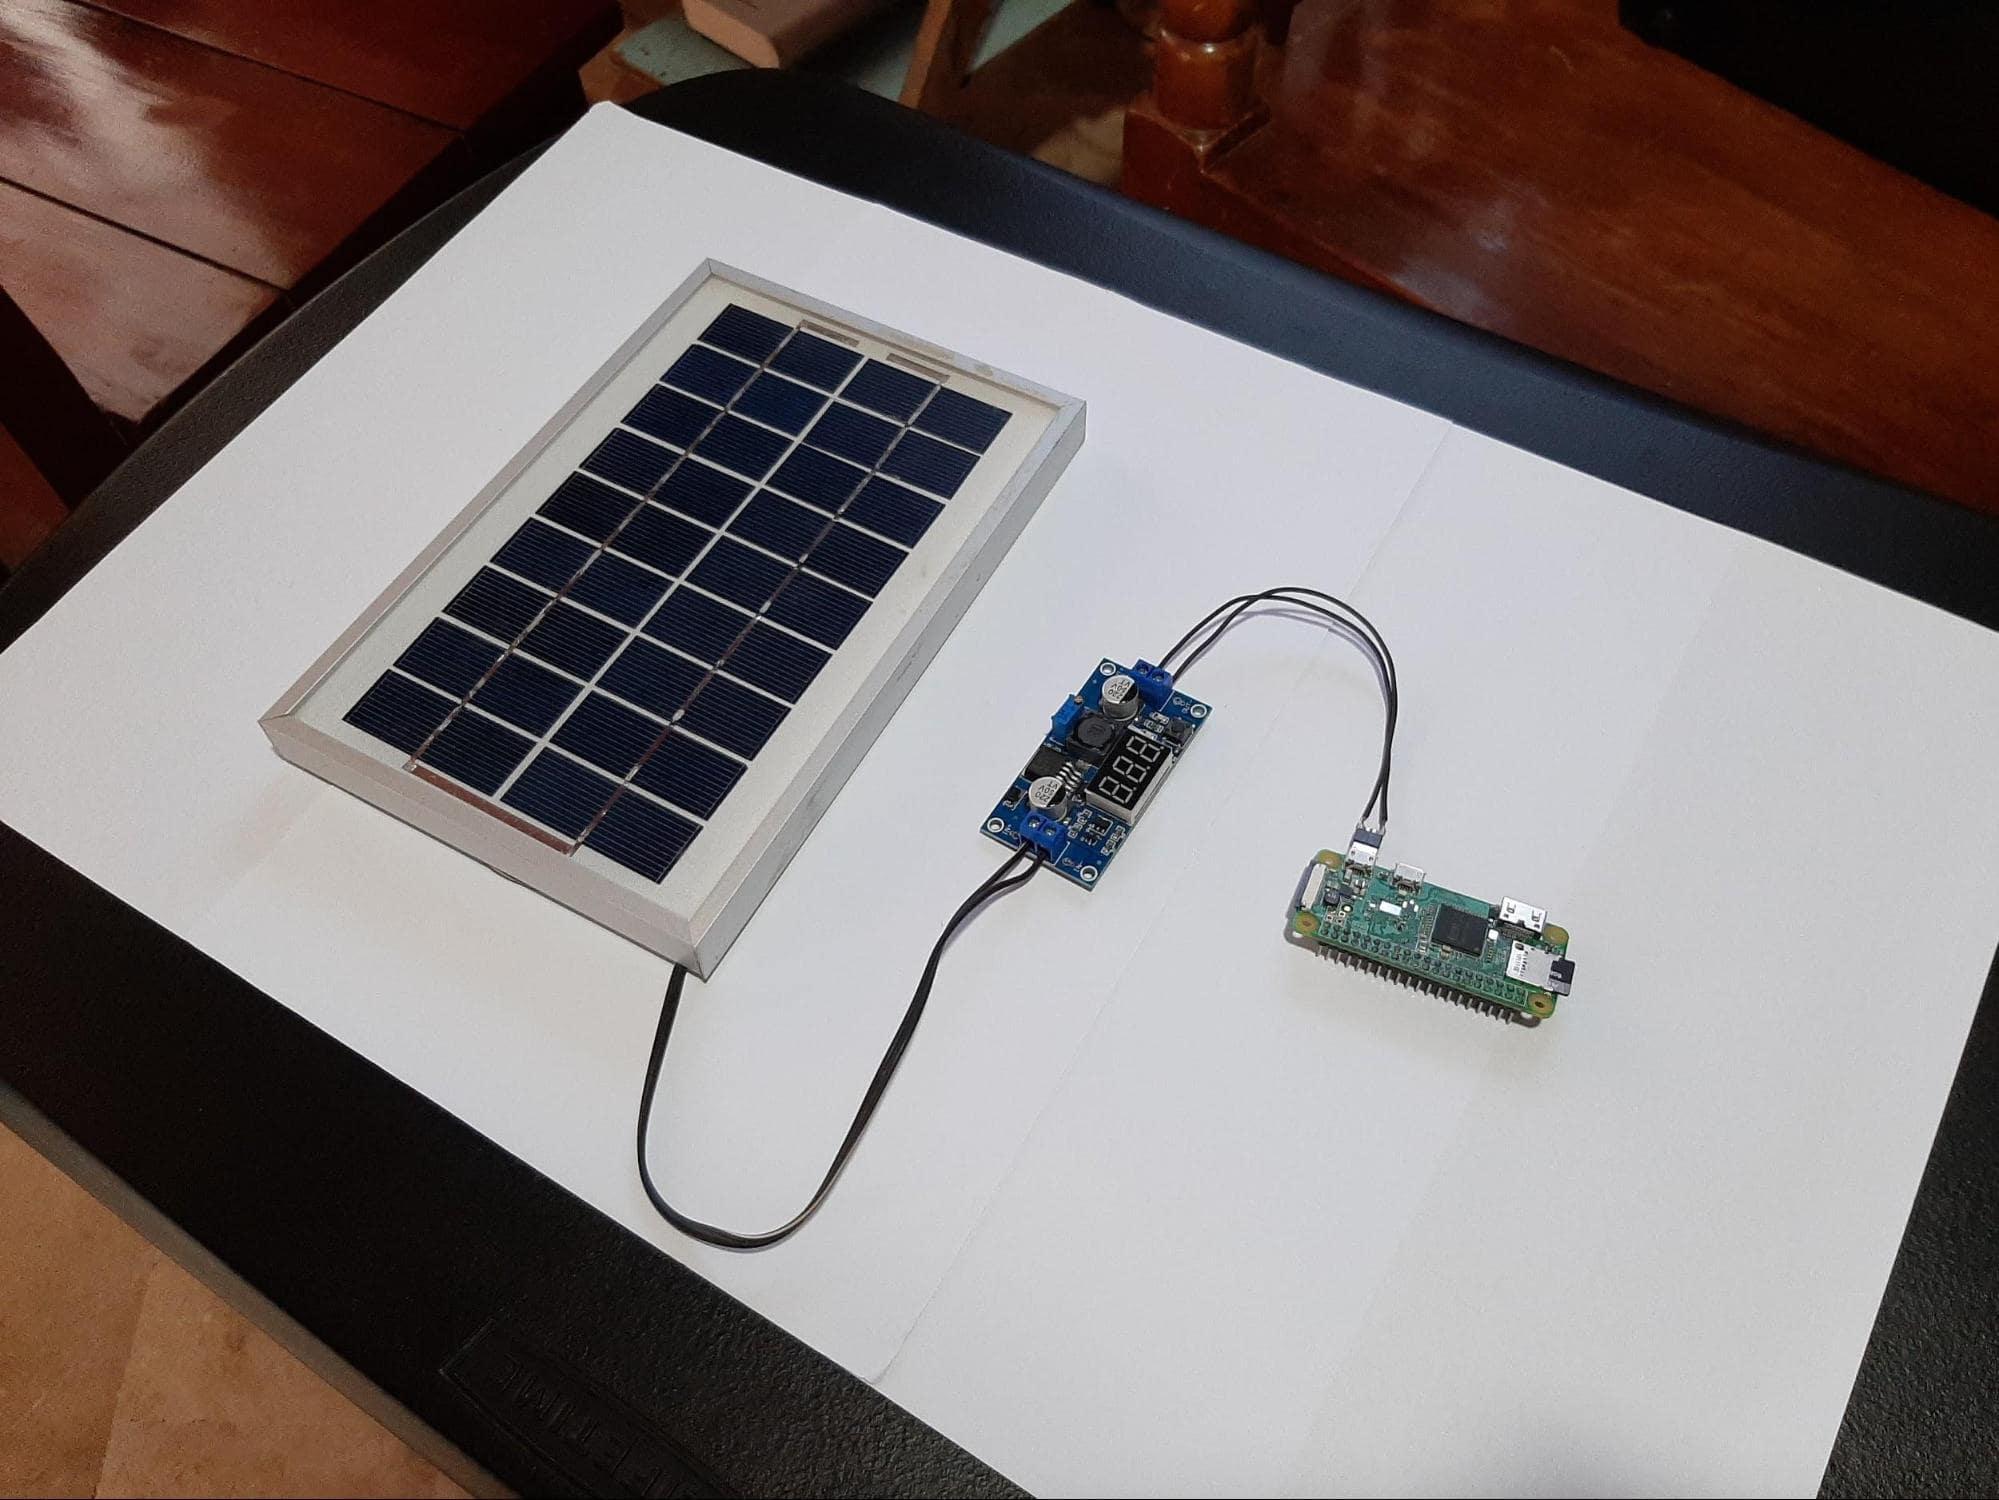 Raspberry_Pi_Solar_Panel_RW_MP_image3.jpg